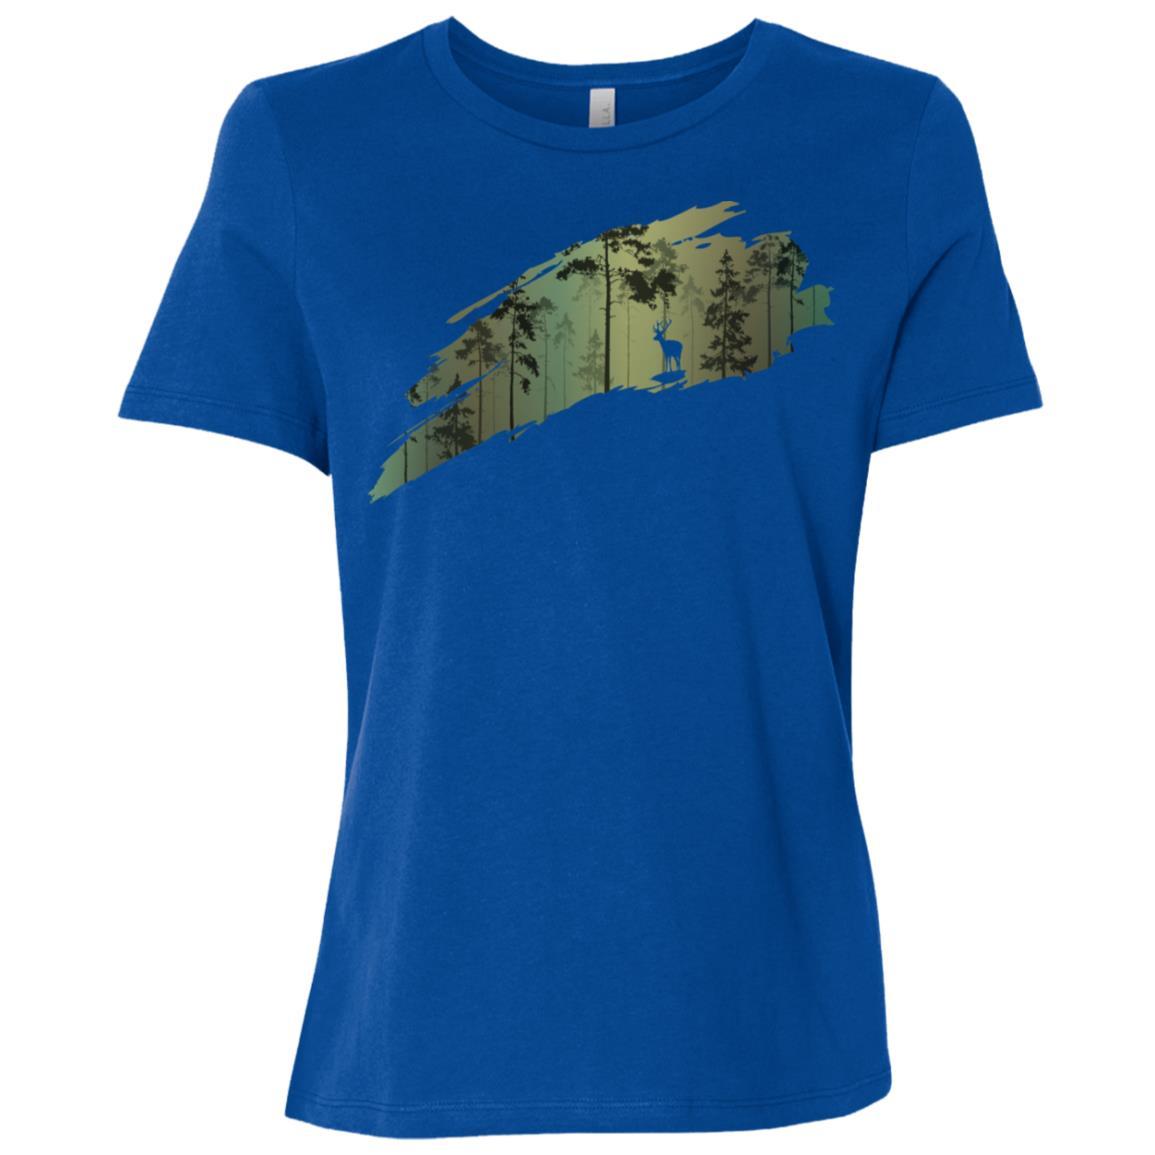 Deer Hunting Women Short Sleeve T-Shirt